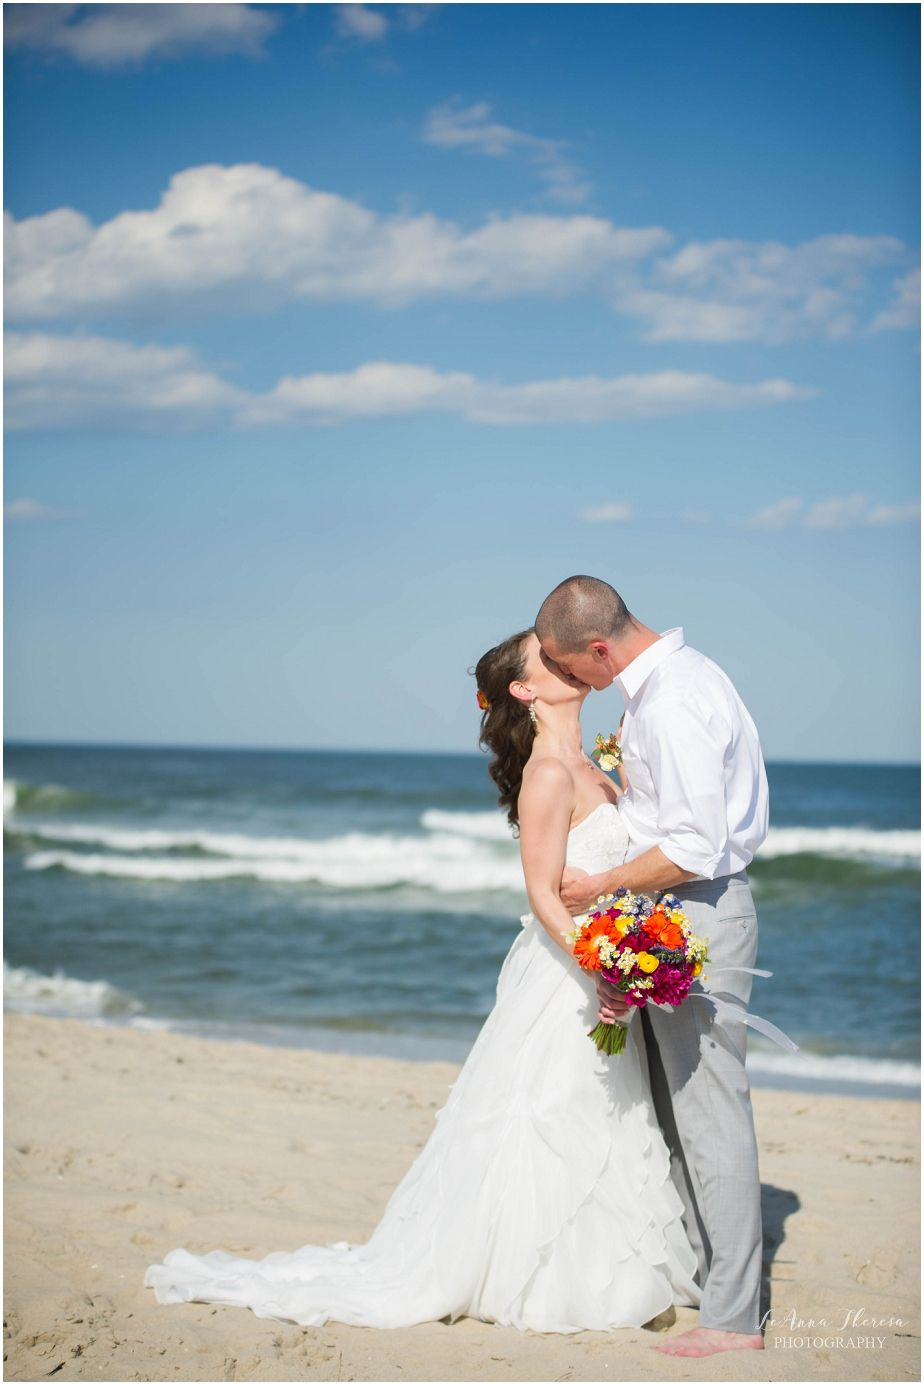 New jersey beach wedding nj beach wedding venues nj wedding new jersey beach wedding nj beach wedding venues nj wedding photographer beach wedding junglespirit Gallery